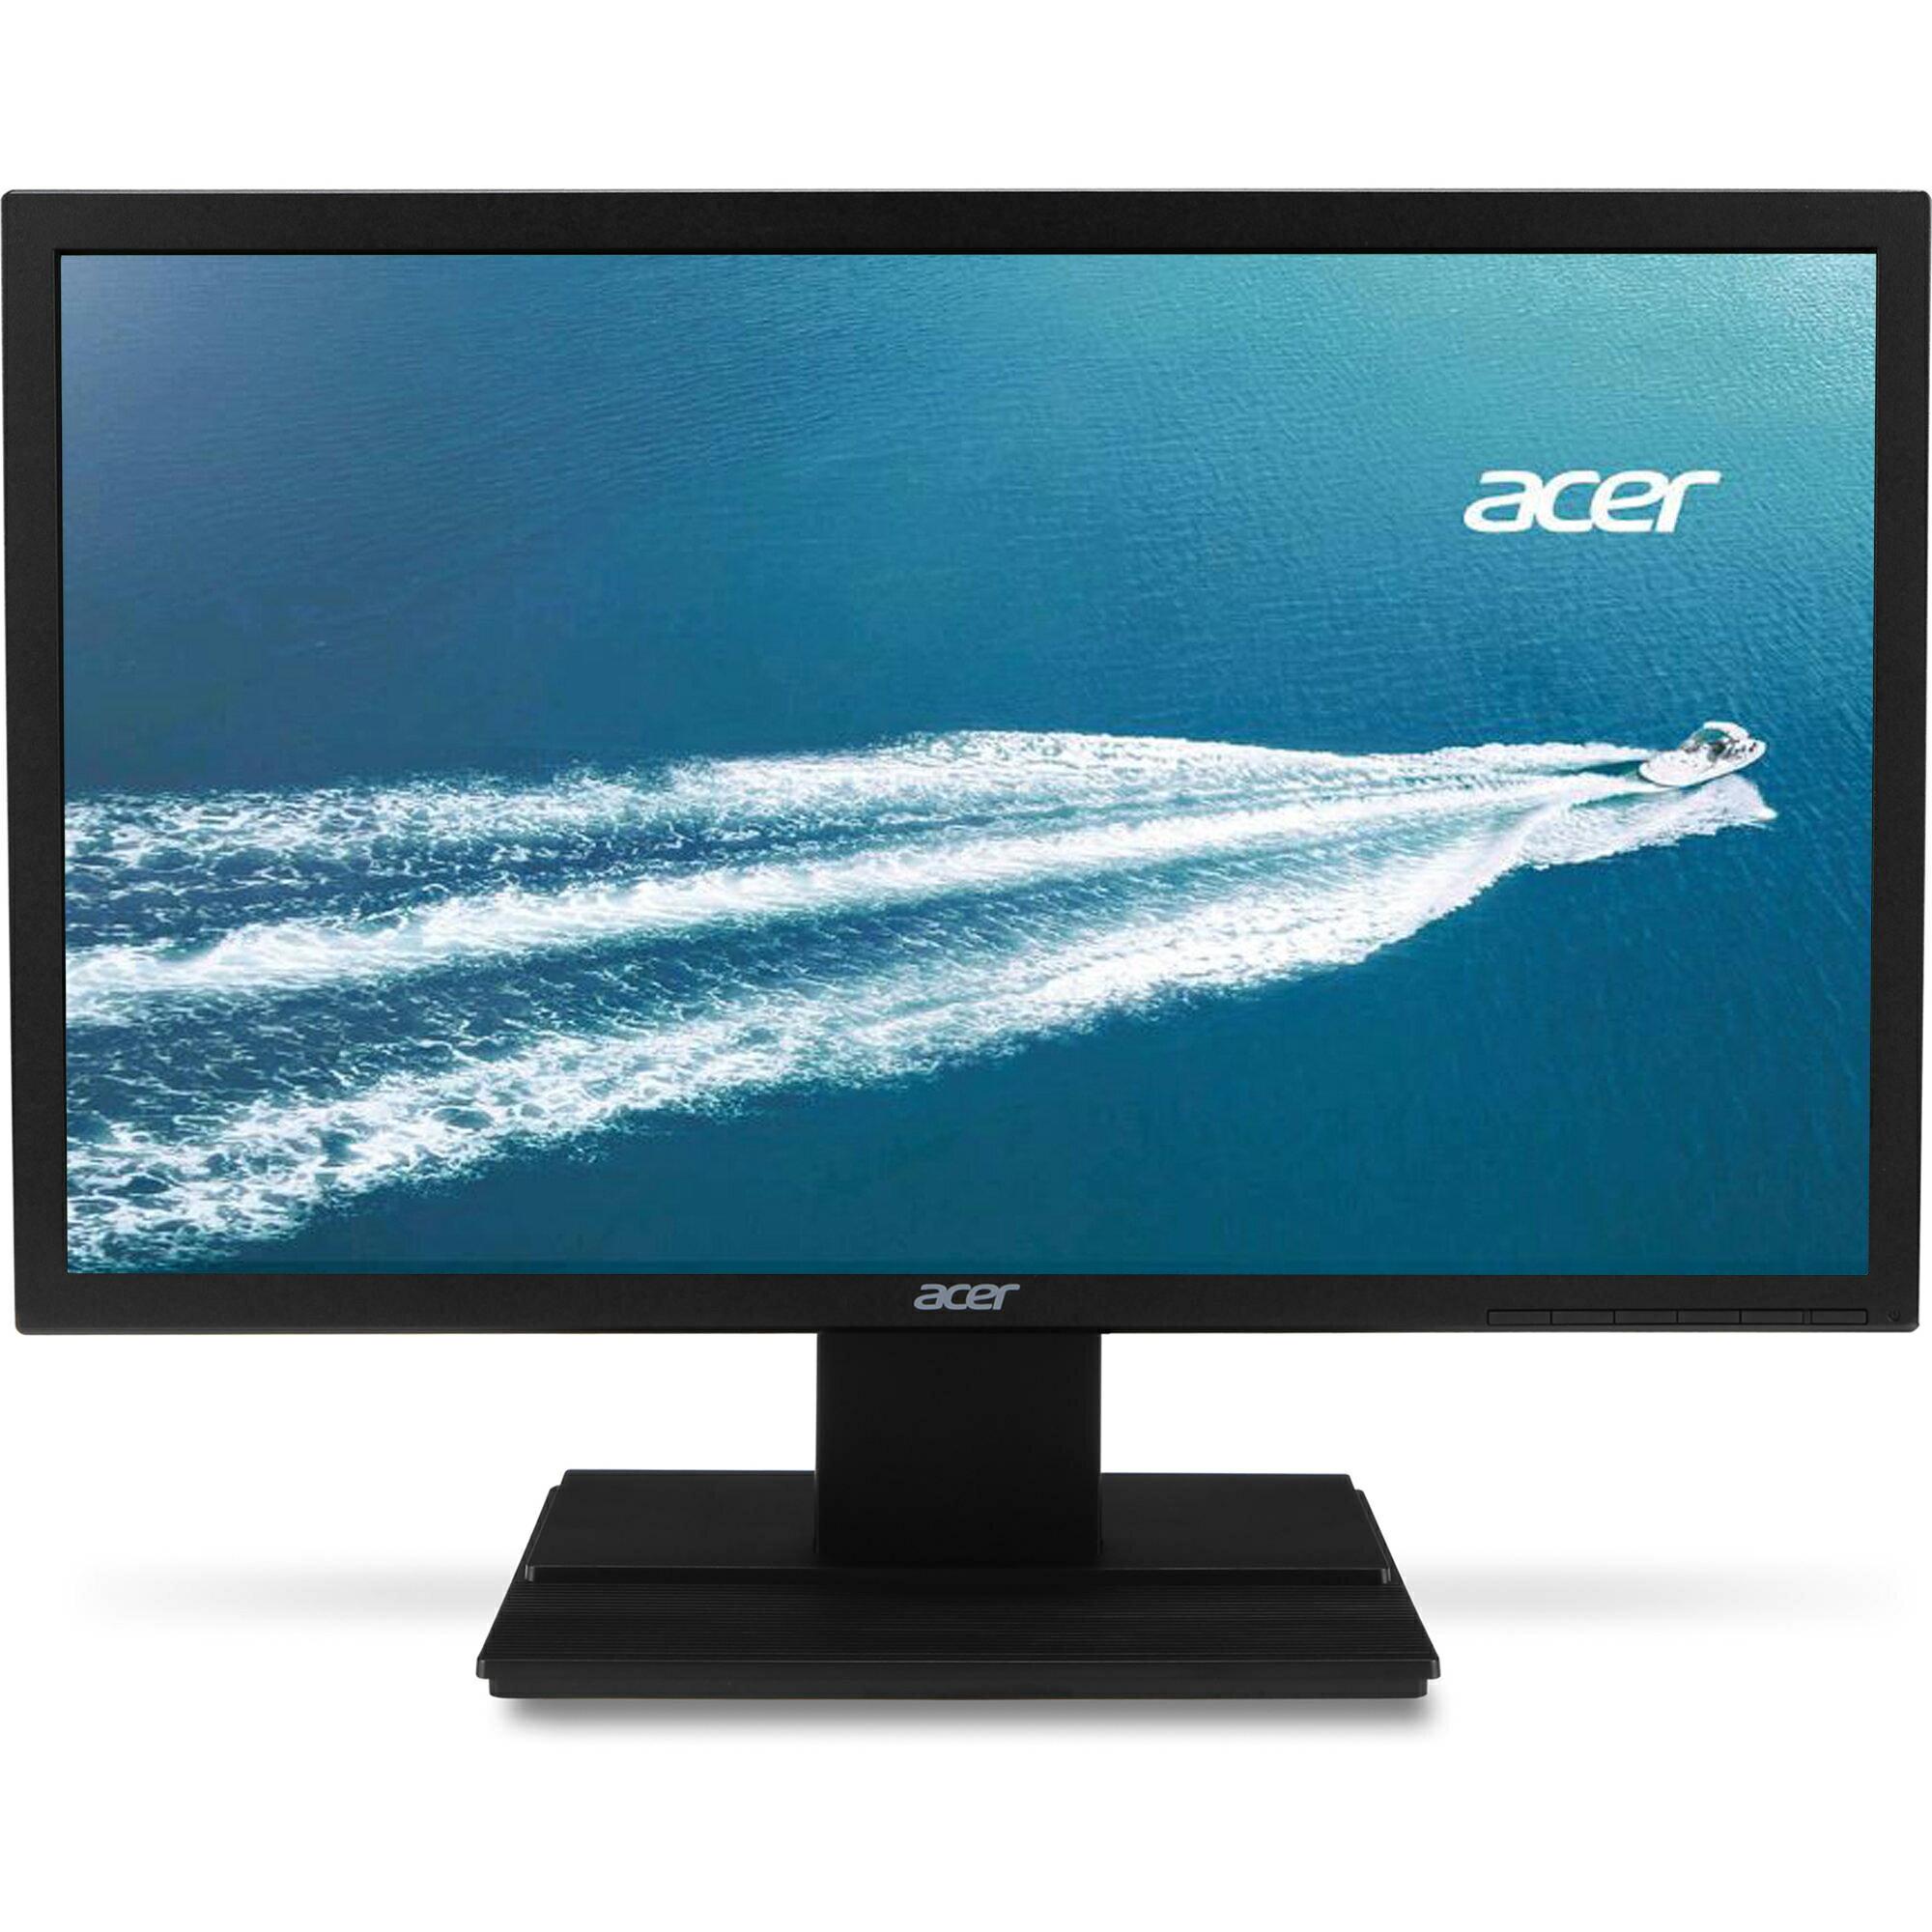 "Acer 24"" Widescreen LCD Monitor Display Full HD 1920 X 1080 5 ms TN Film|V246HL 0"